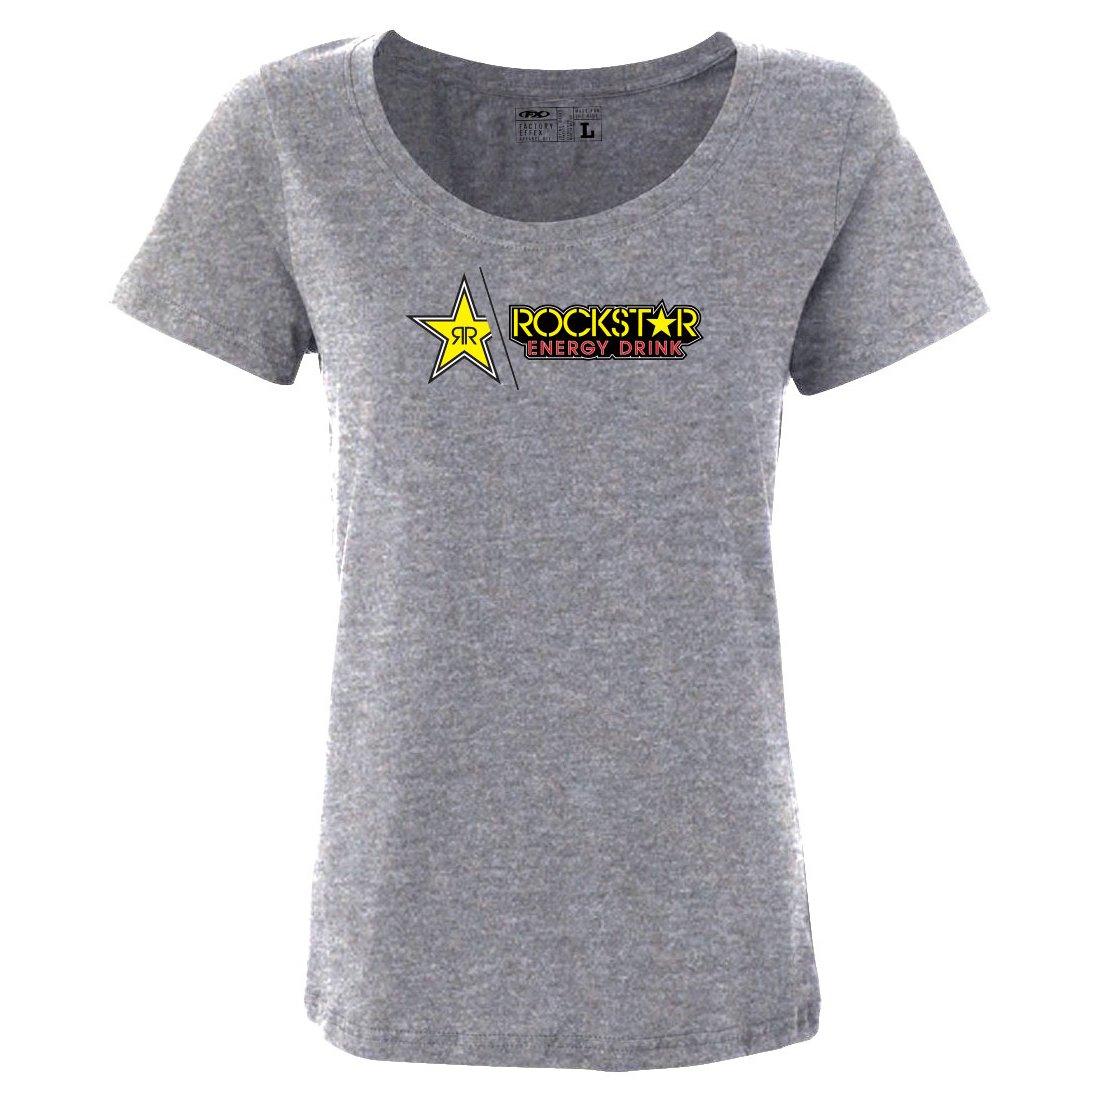 Black, X-Large Factory Effex Rockstar Split Womens T-Shirt 17-87664